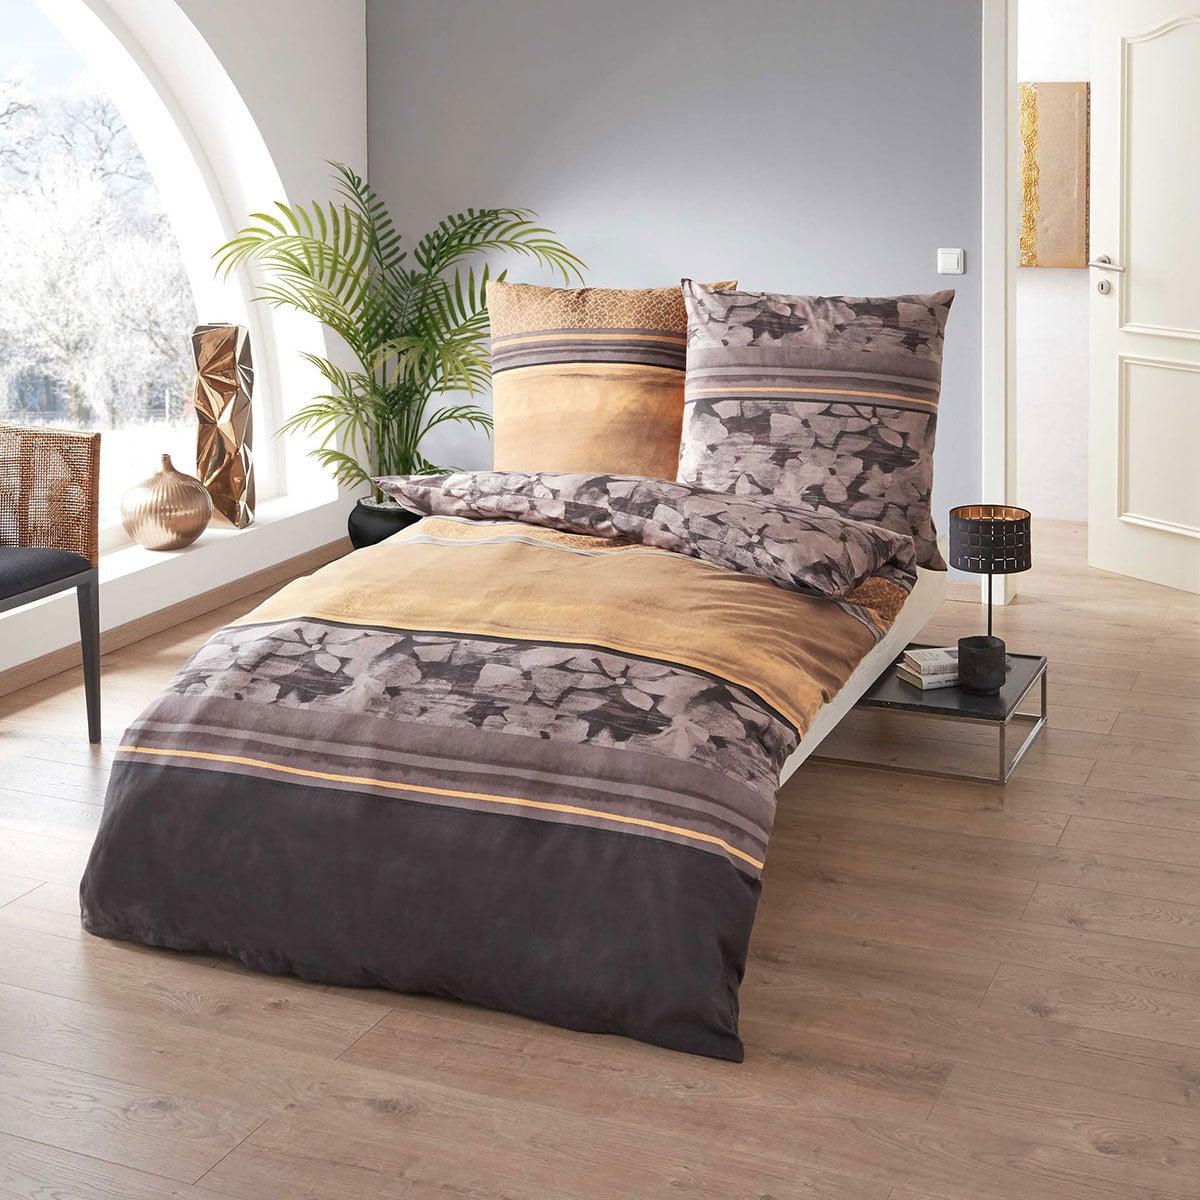 kaeppel biber bettw sche jane ocker g nstig online kaufen bei bettwaren shop. Black Bedroom Furniture Sets. Home Design Ideas